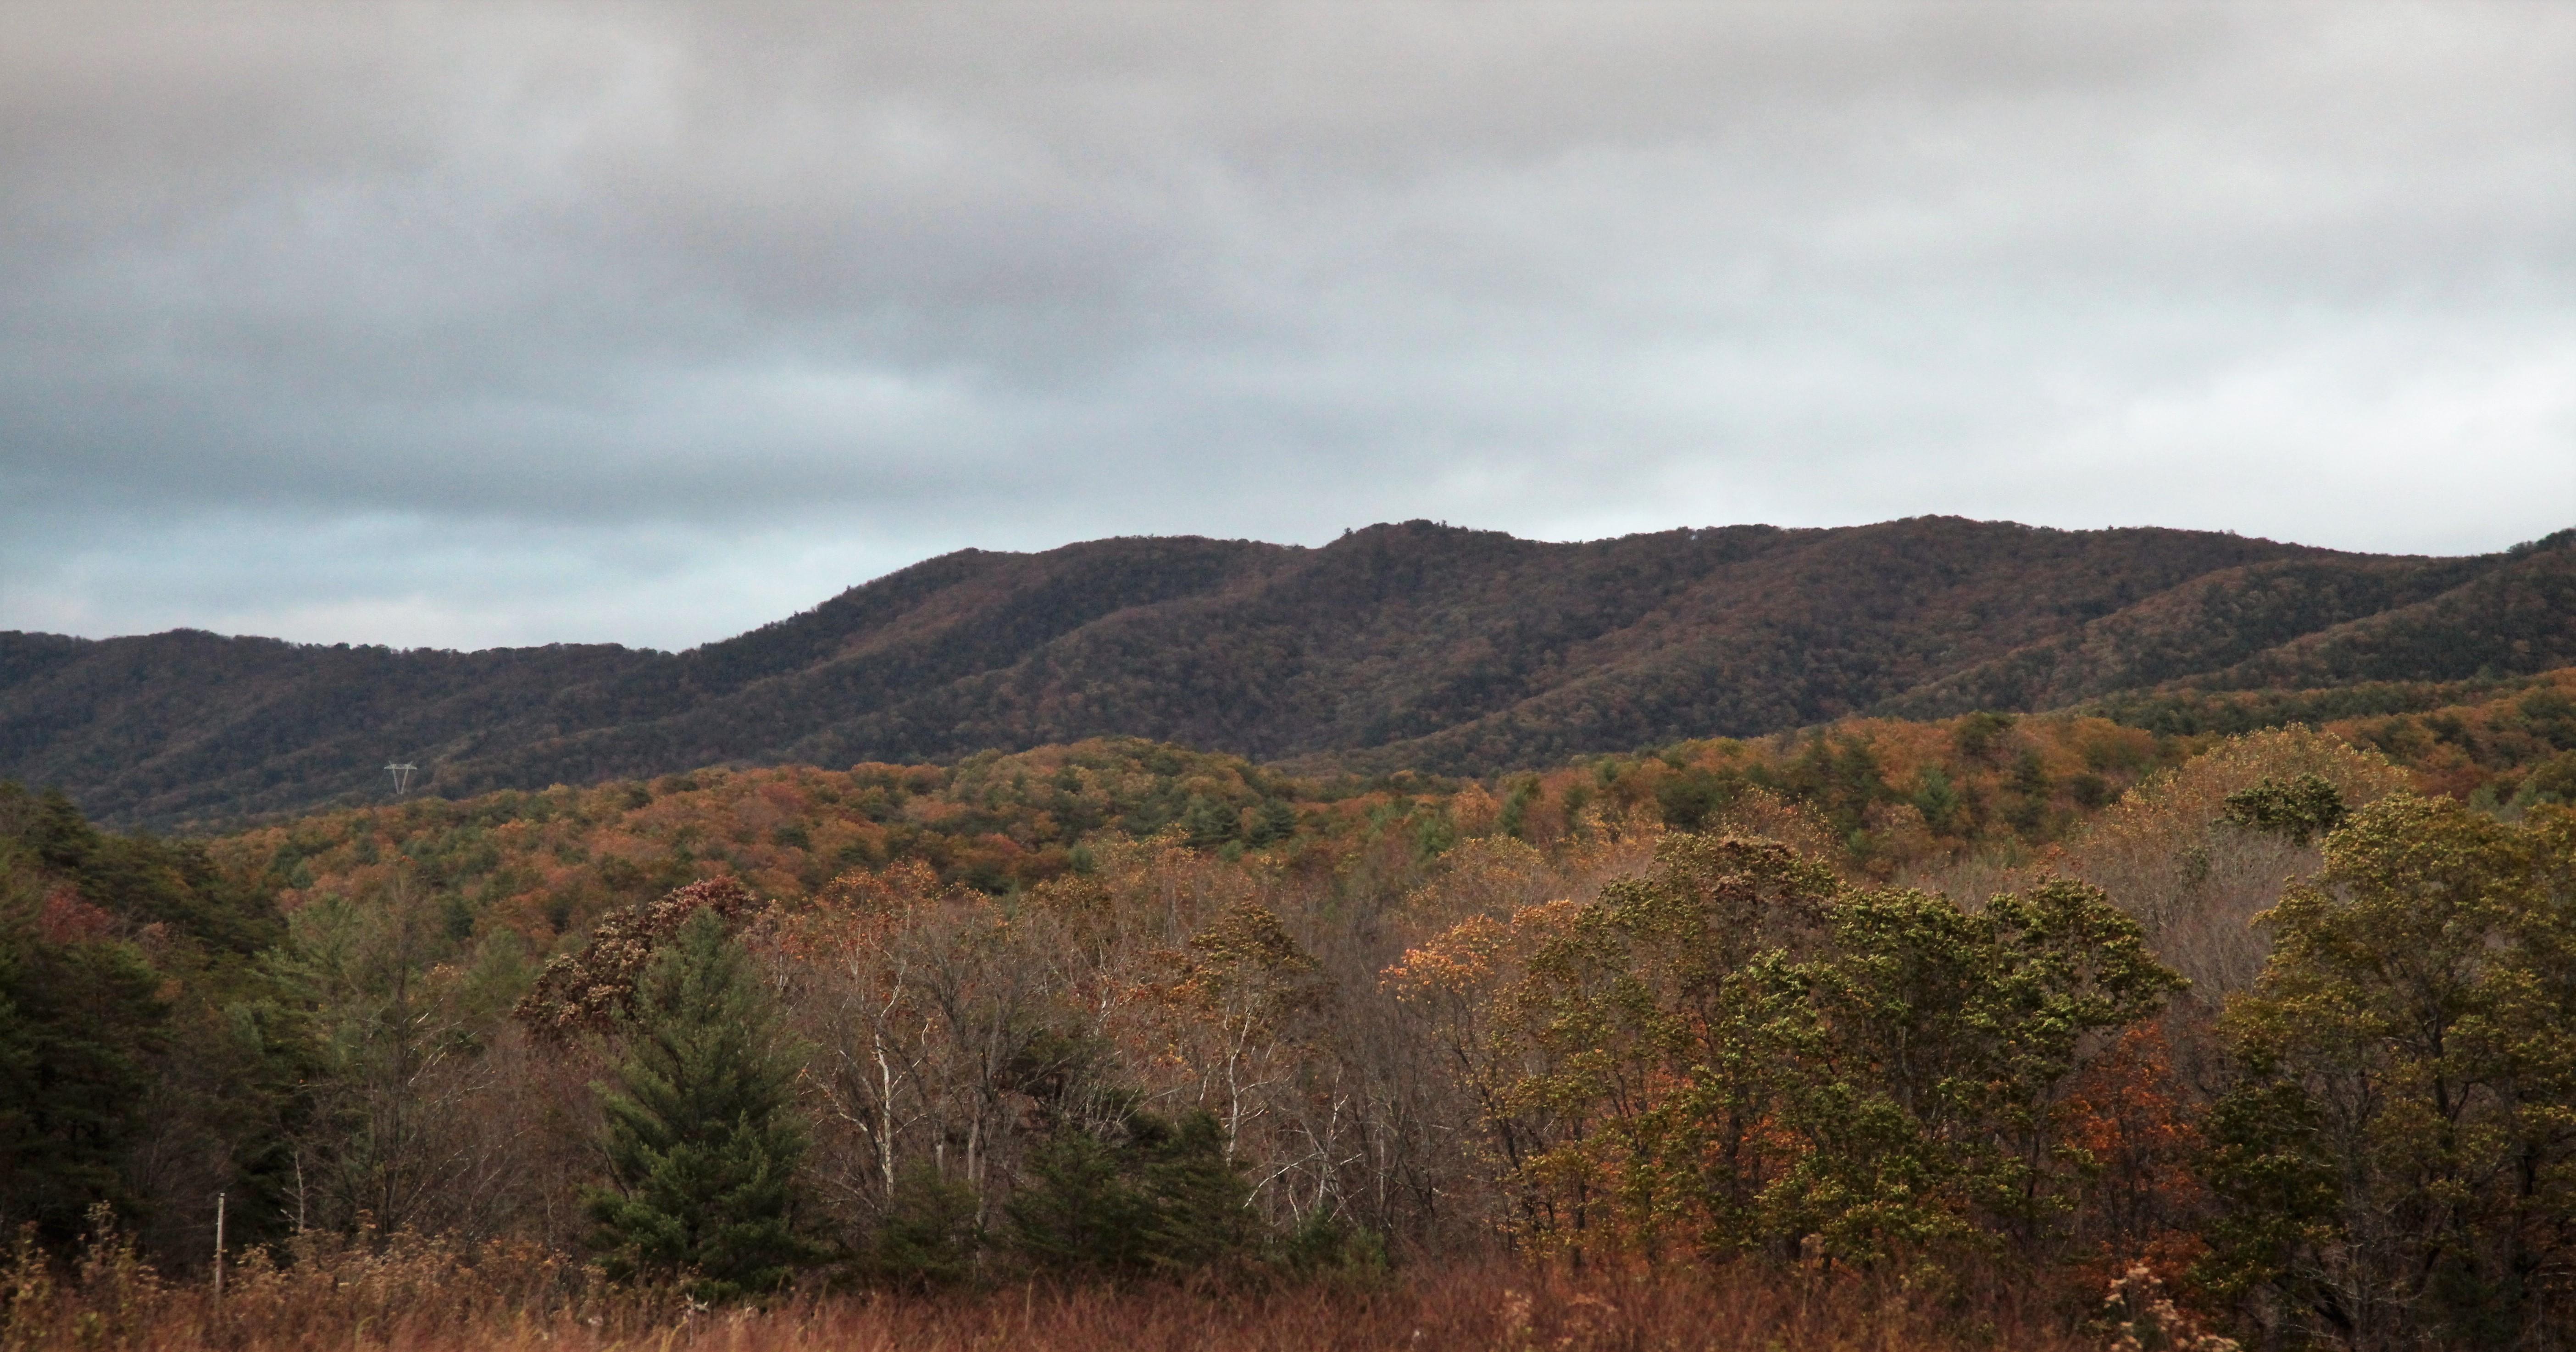 Brush Mtn, in Brush Mountain Wilderness, looking south near Caldwell Fields on Va 635.jpg